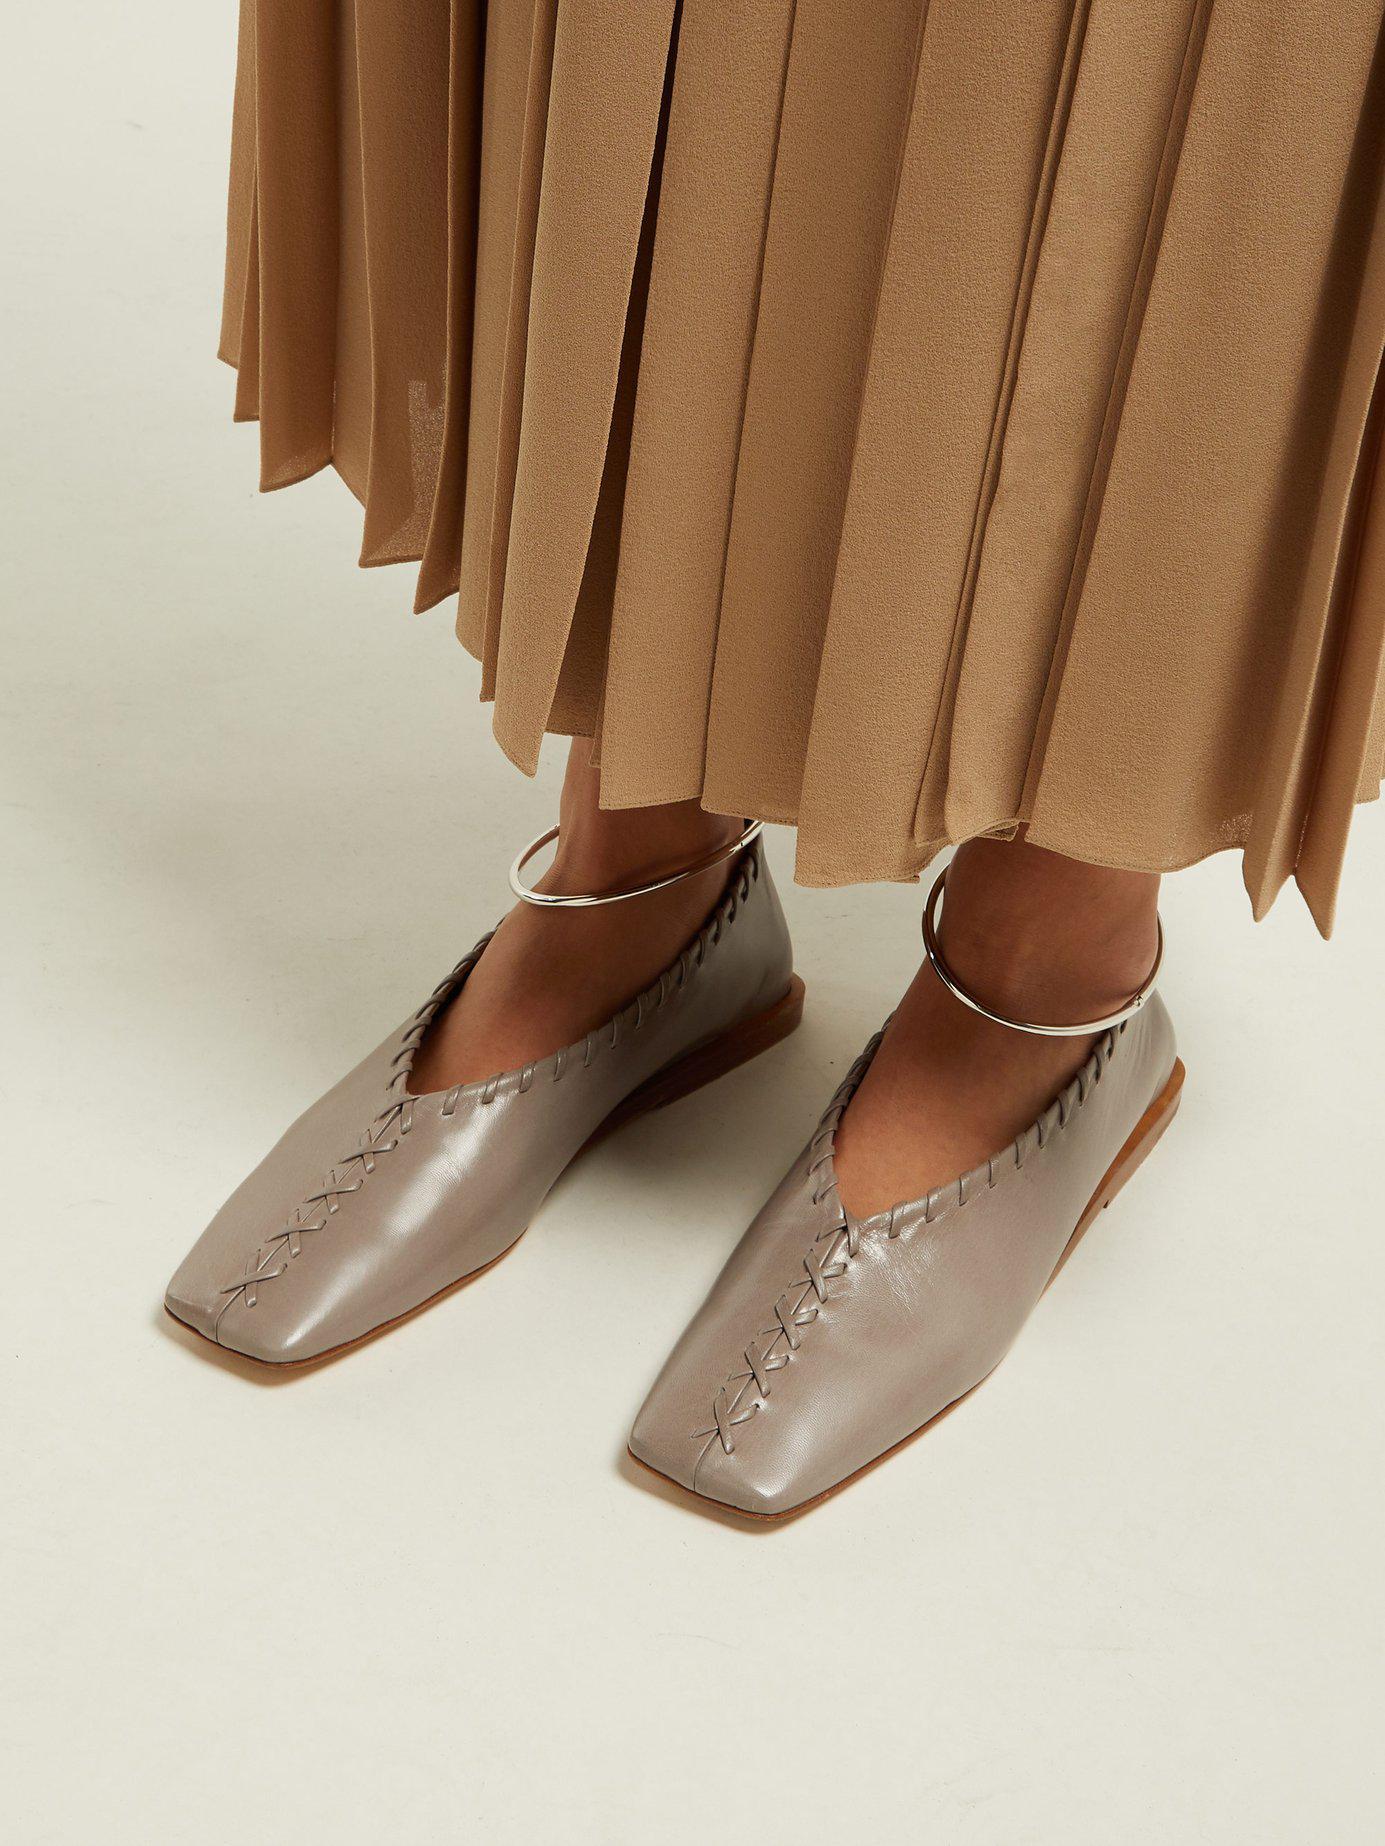 Jil Sander Leather Stitch-detailed Ballet Pumps in Grey (Gray) - Lyst